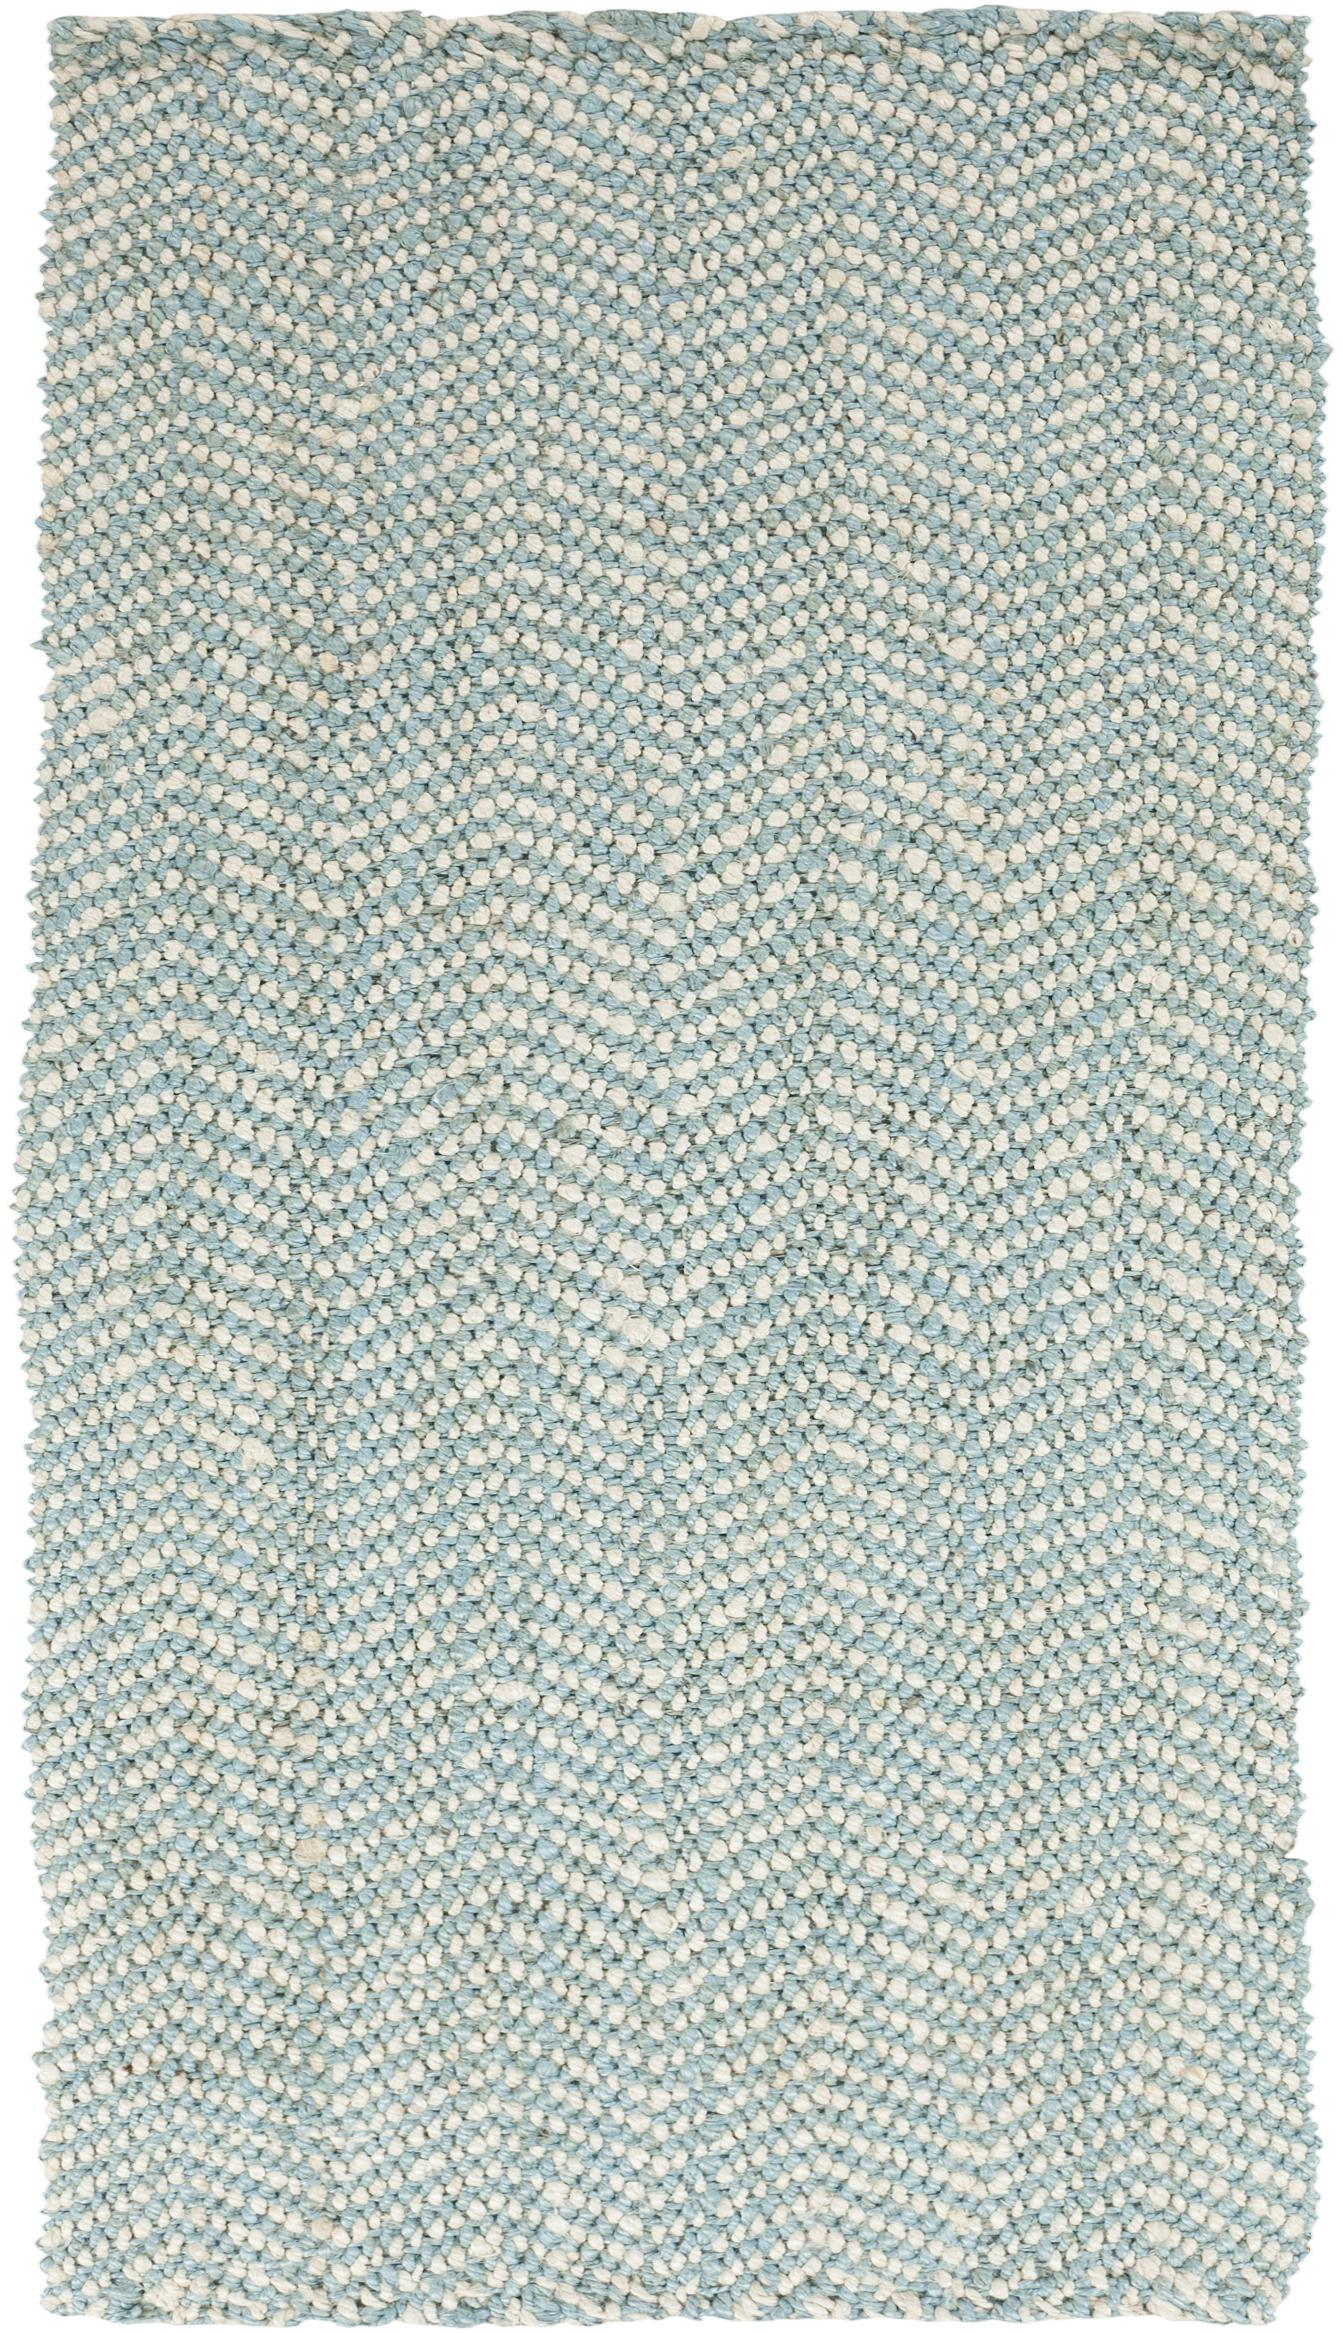 Surya Reeds 8' x 11' - Item Number: REED802-811